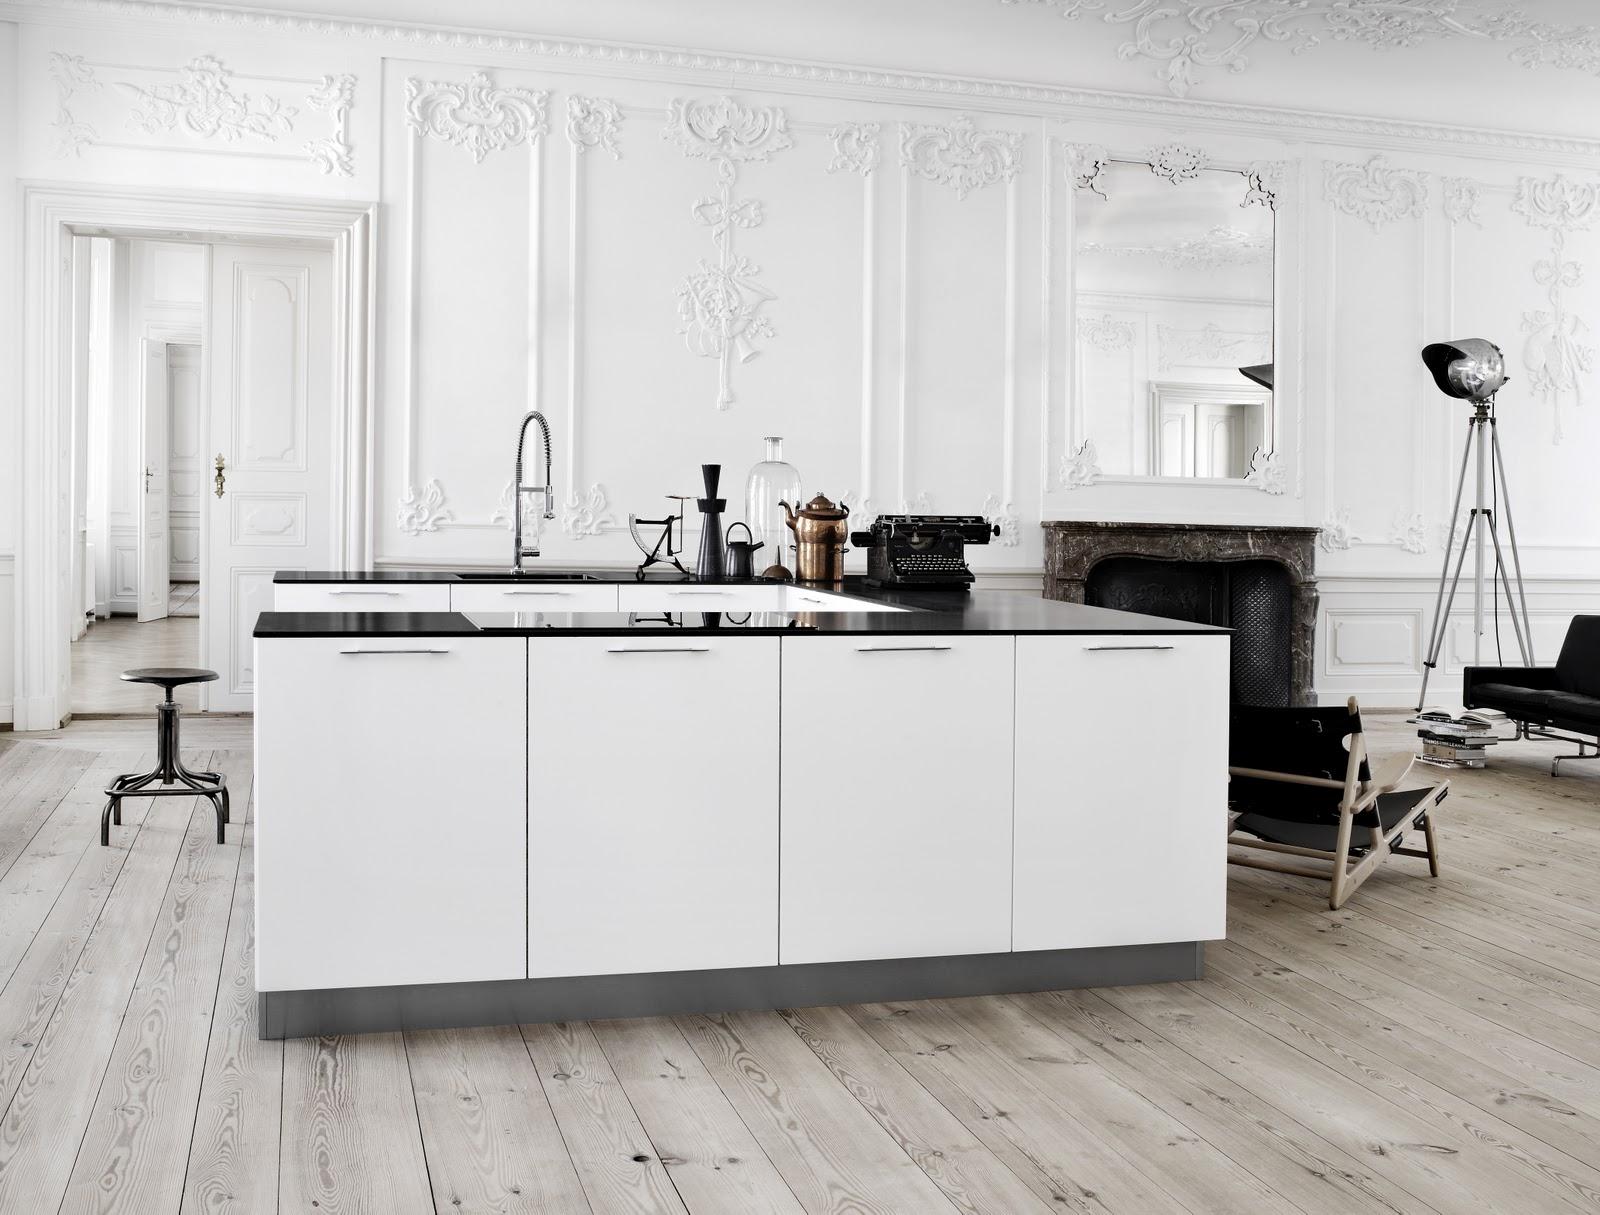 Deense Design Keukens : Funky Friday blog: Modieus Deens keukendesign ...